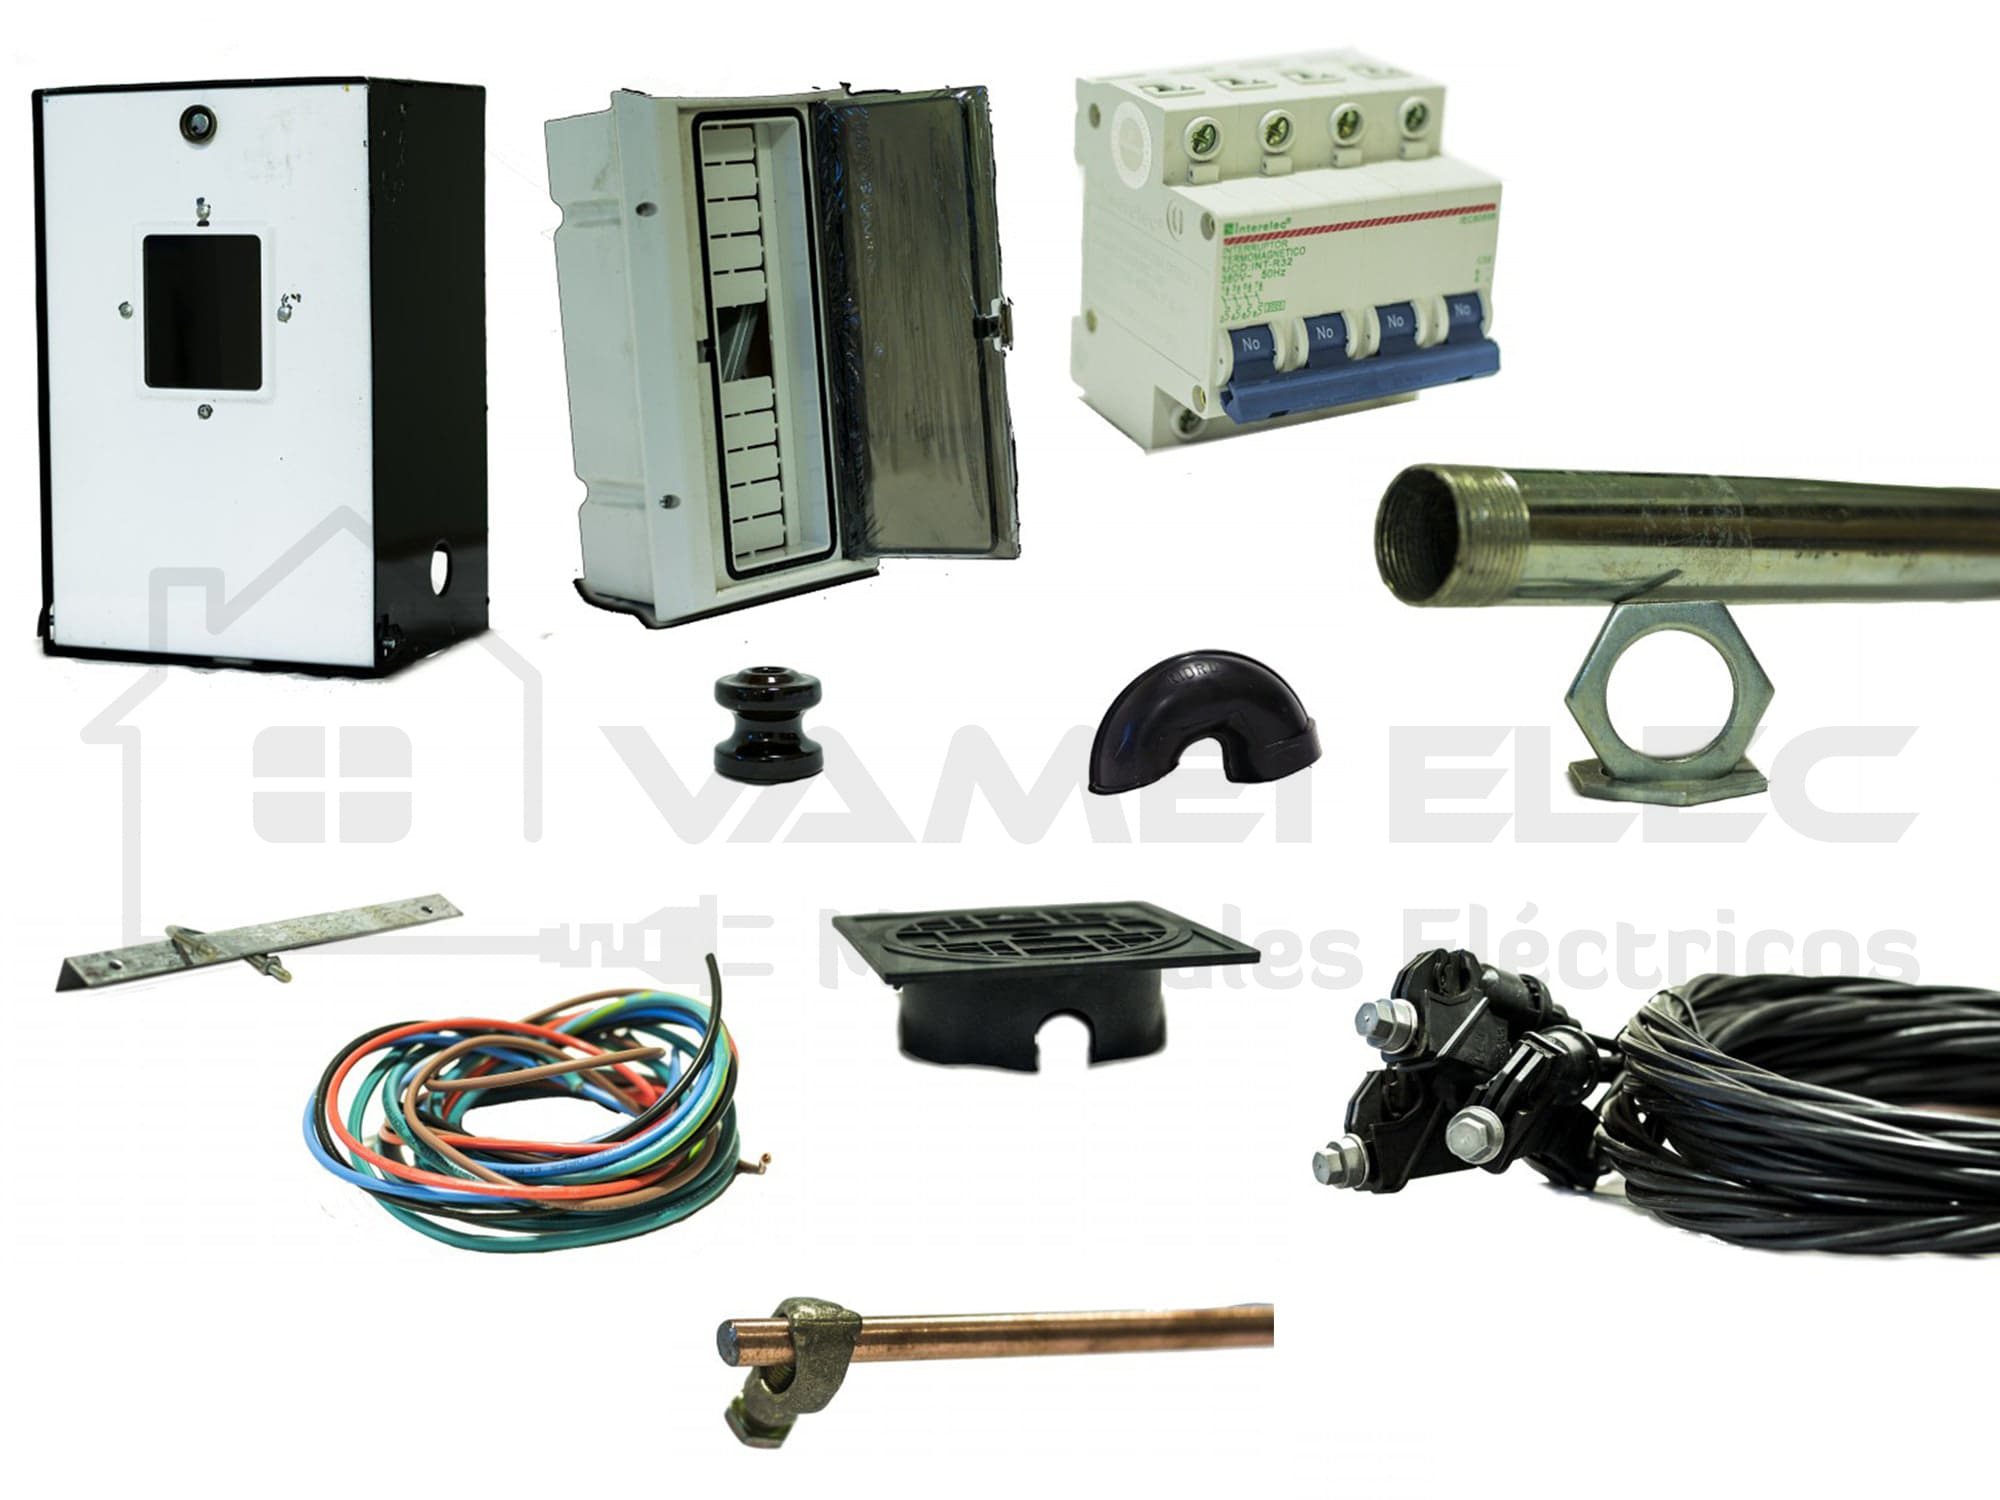 VAMEI Elec - Kit de conexión EPE - Trifásico Roldan